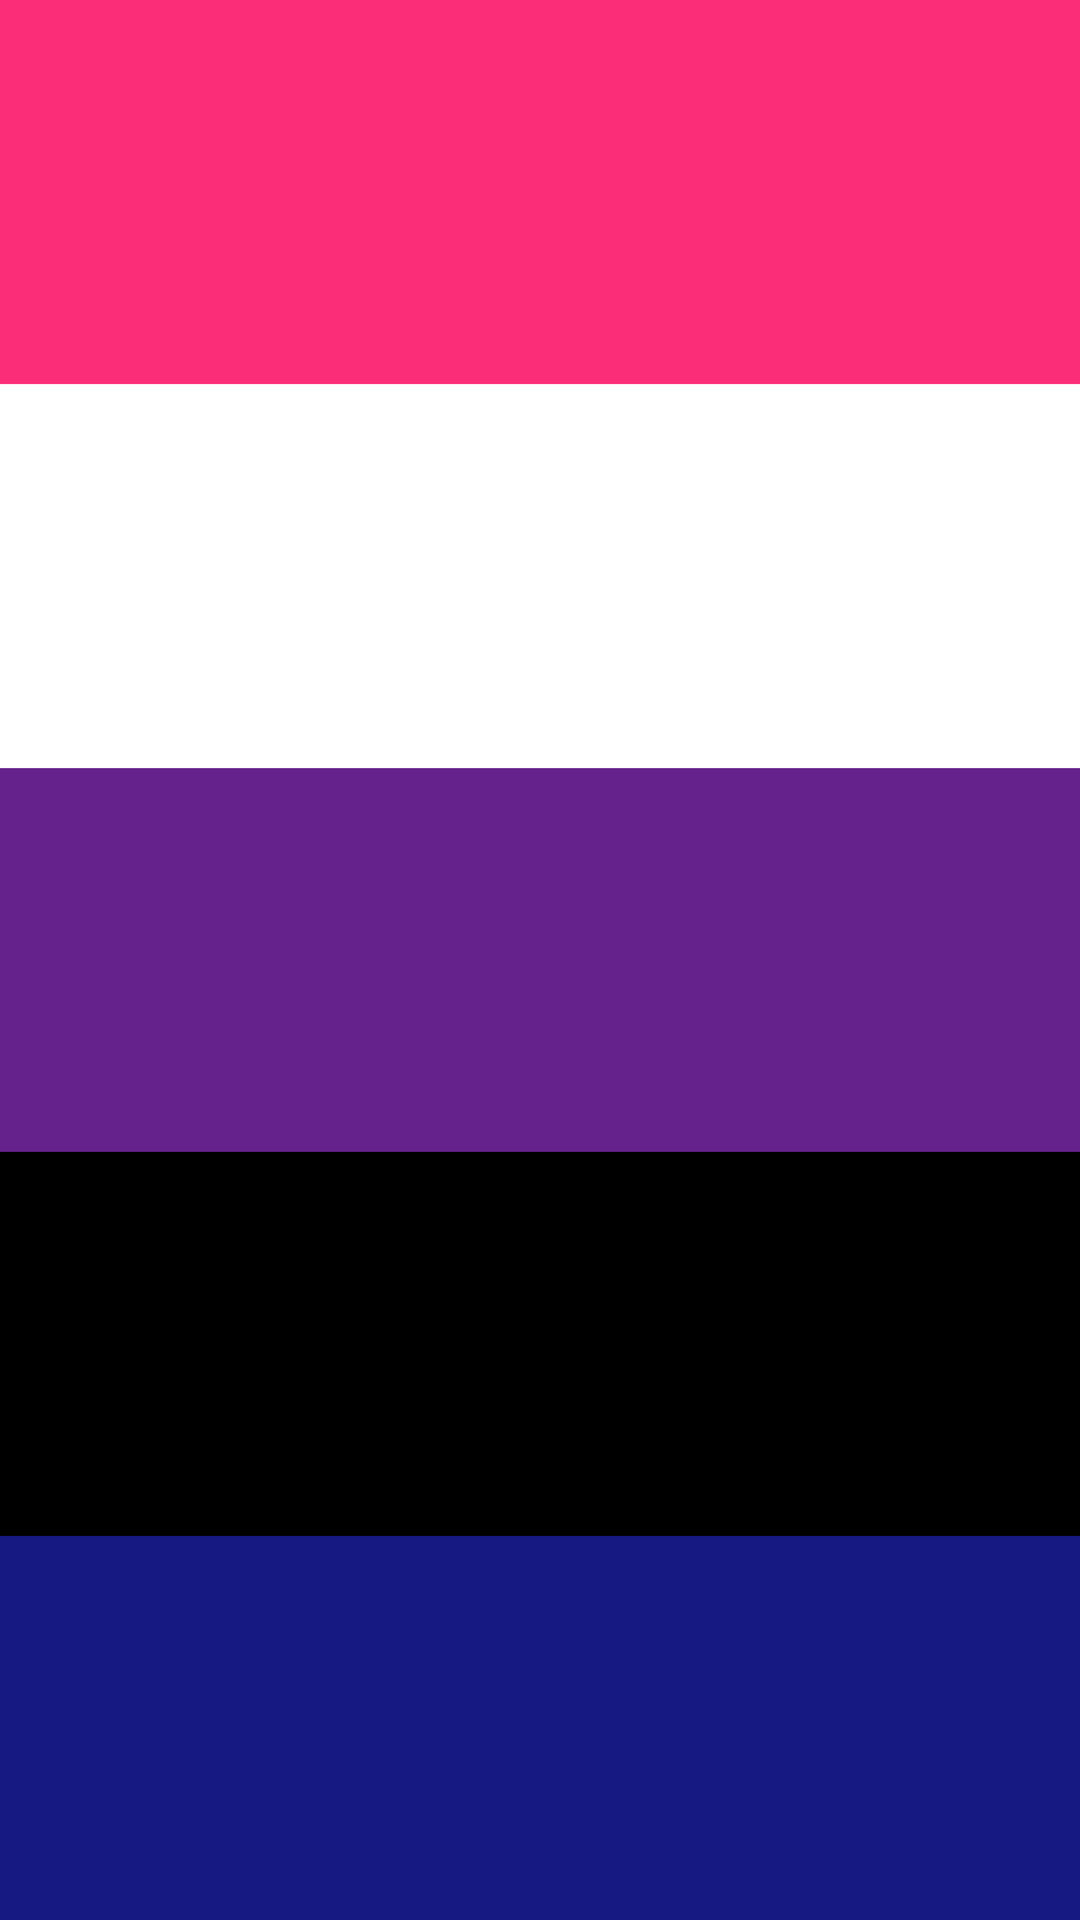 Res: 1080x1920, #lockscreen#background#lock screen#wallpaper#lgbtq#lgbtq+#lesbian#gay#trans#transgender#bisexual#pansexual#ace#aro#asexual#non  ...